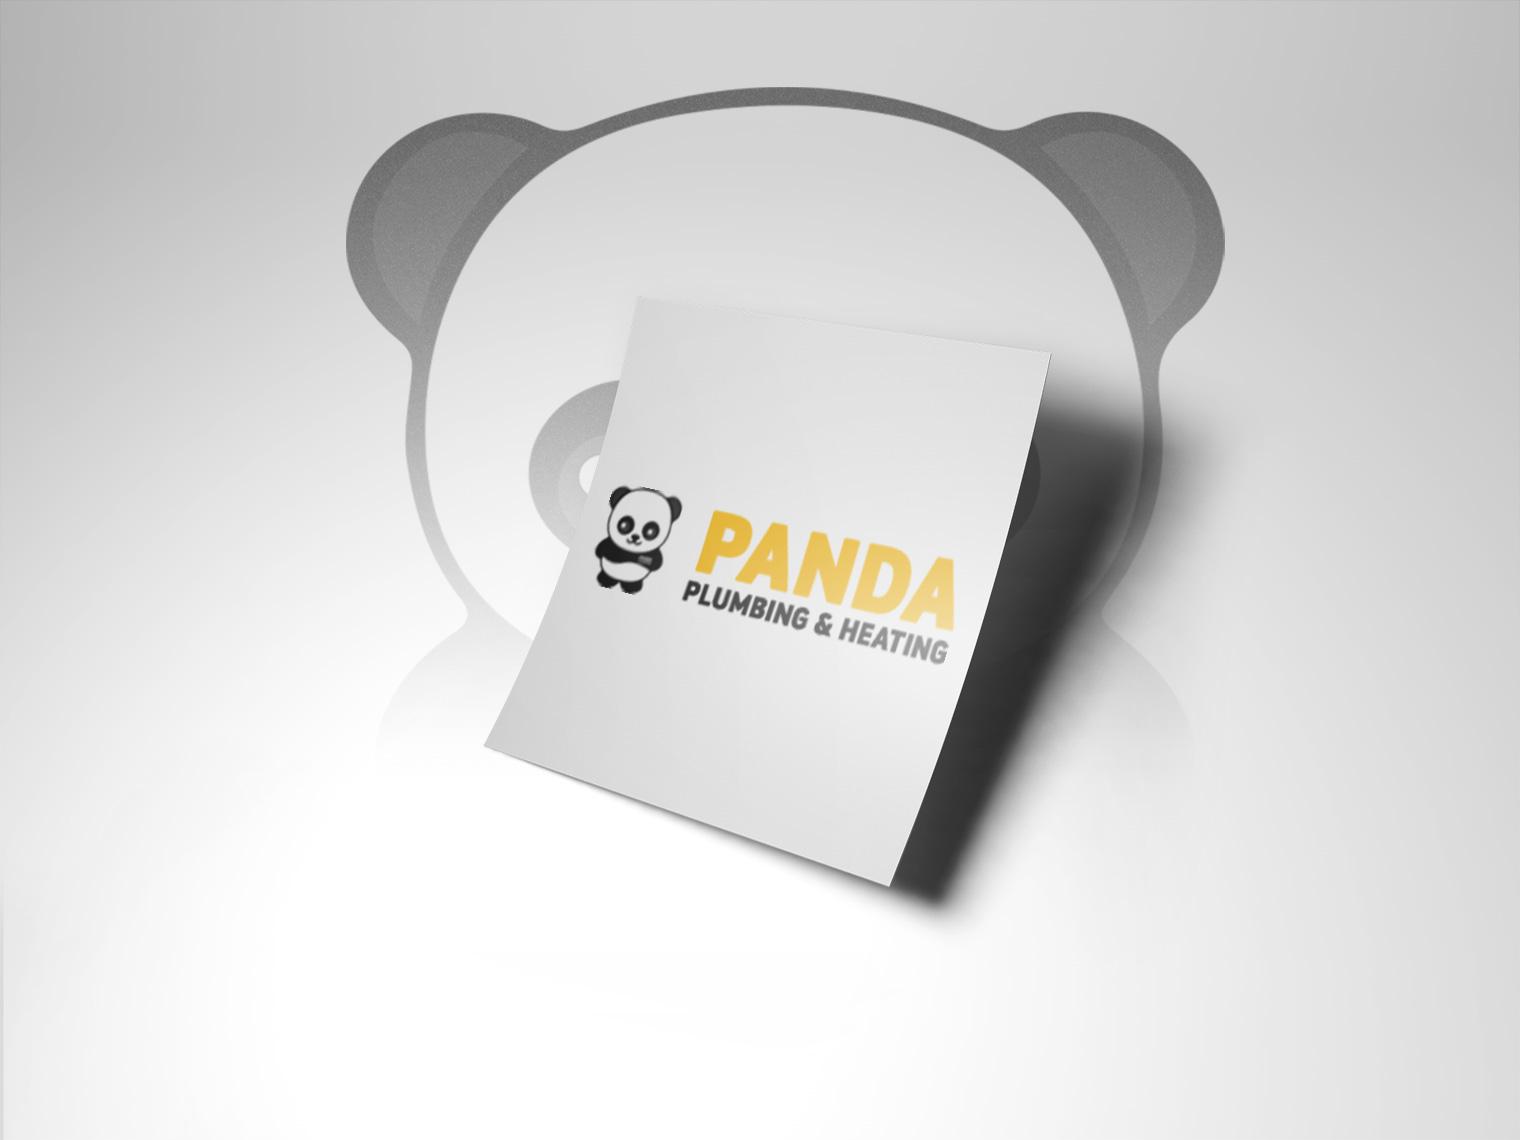 Panda Plumbing and Heating